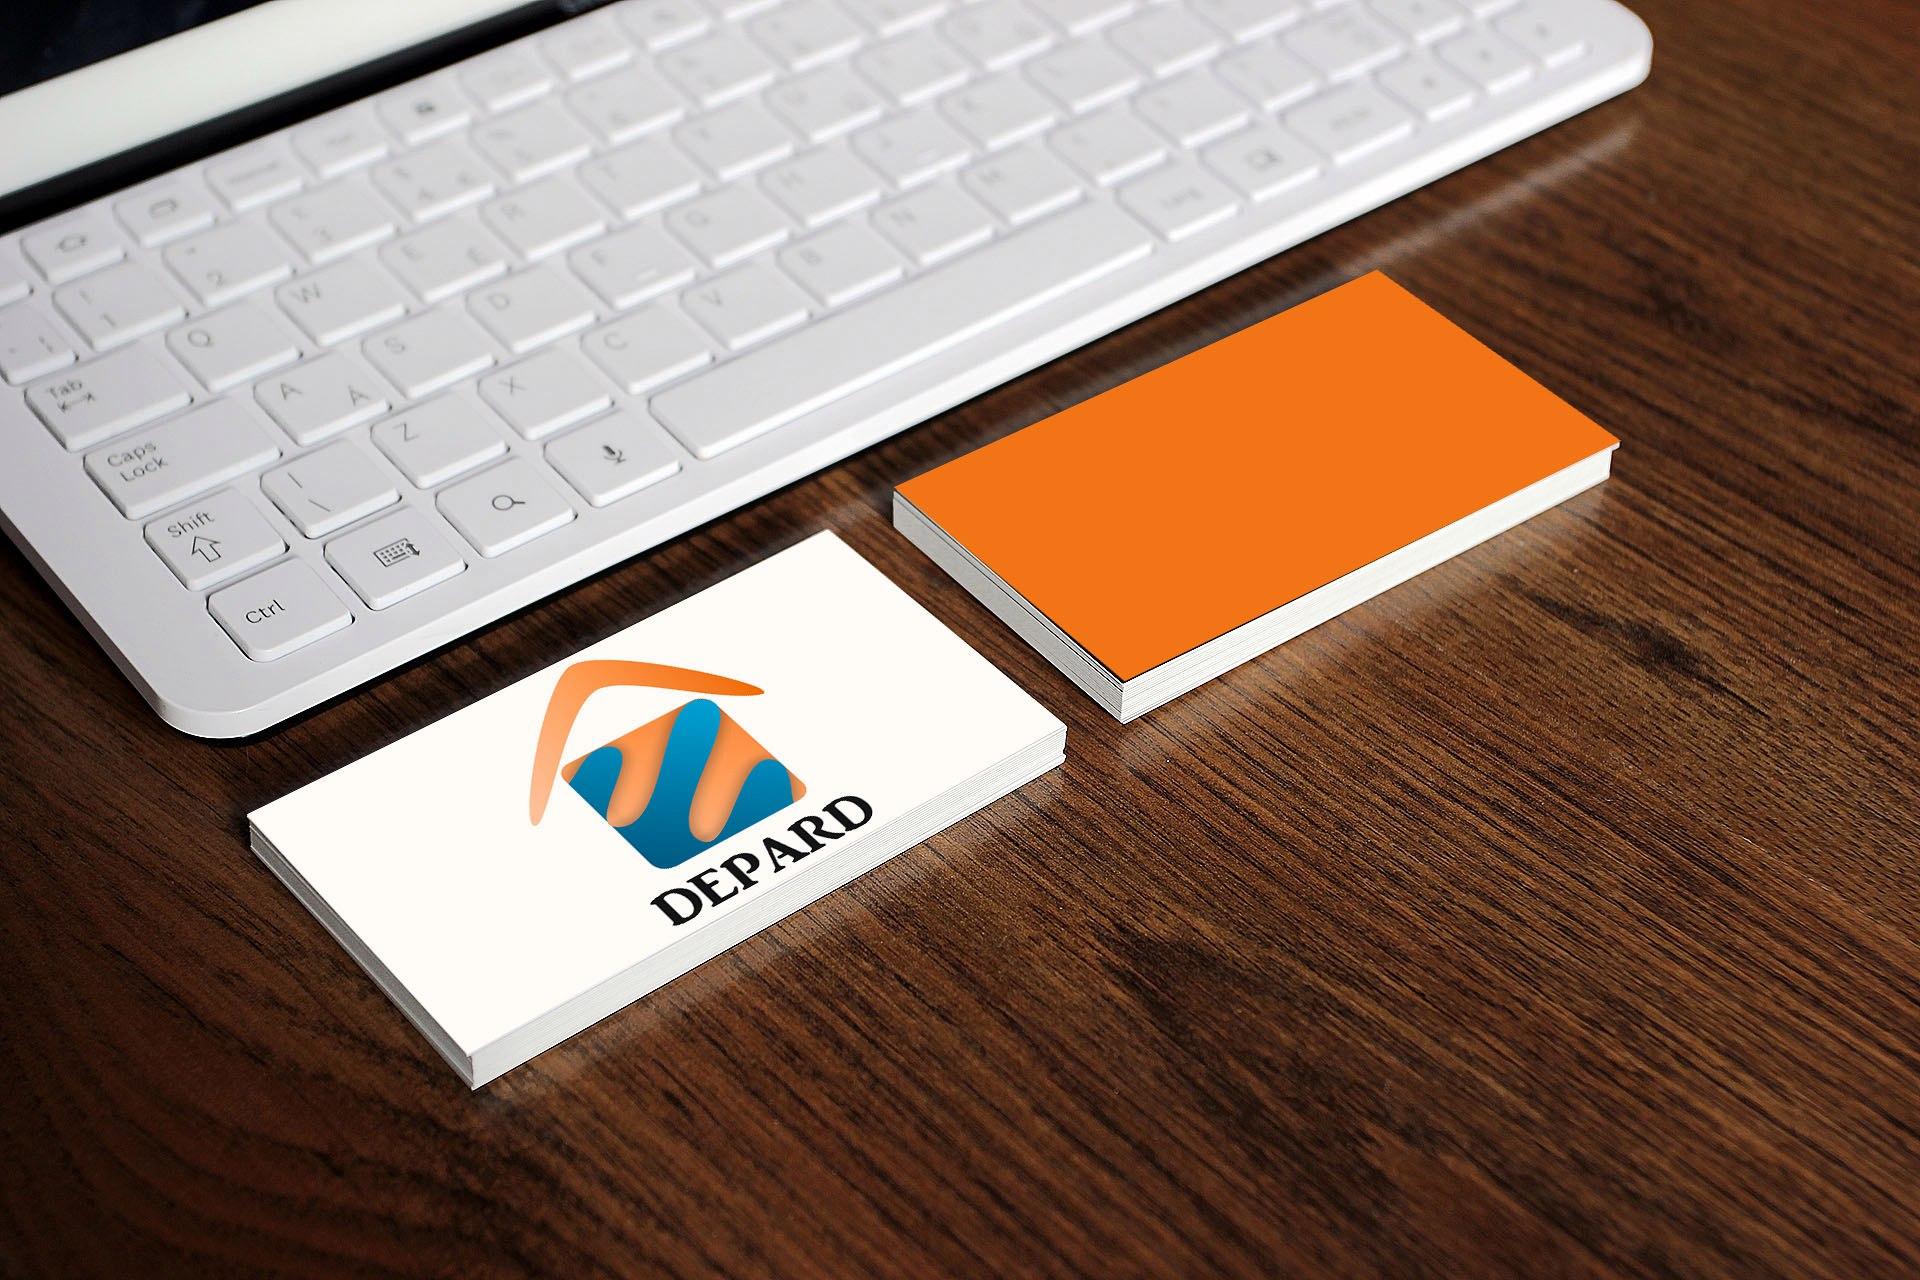 Логотип для компании (услуги недвижимость) фото f_444592fefdc50a4e.jpg